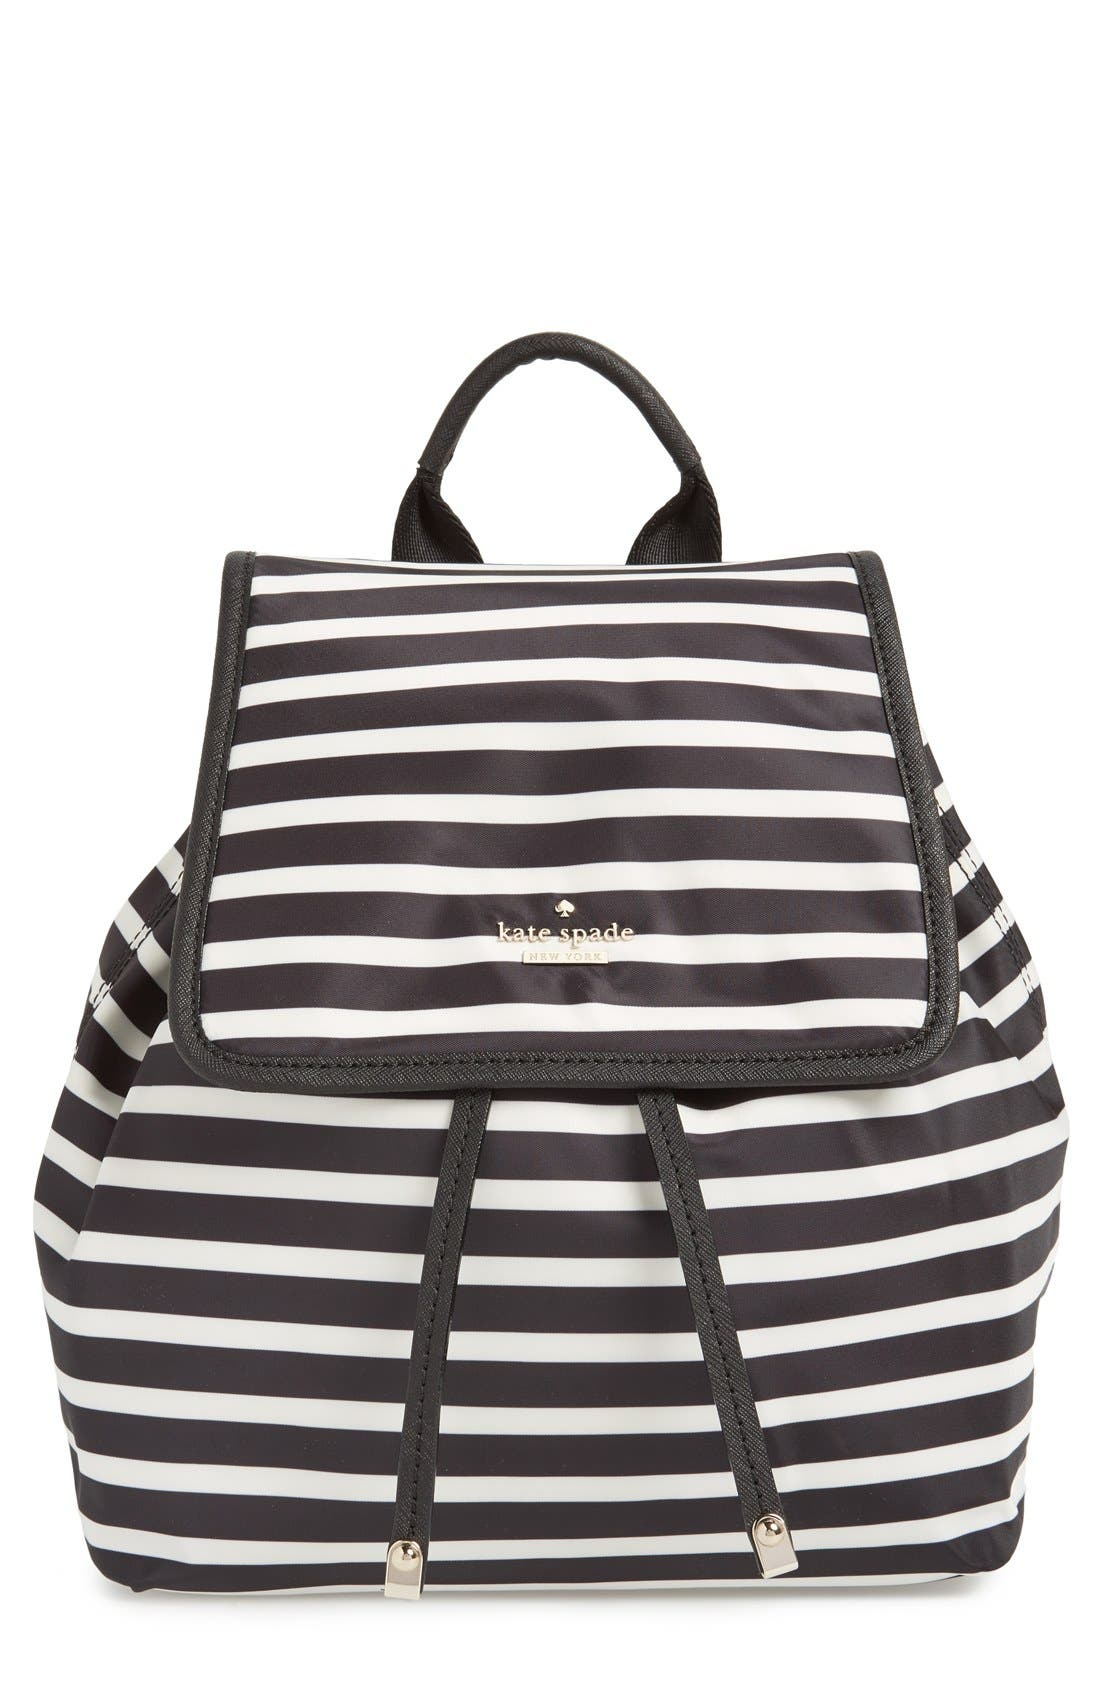 Main Image - kate spade new york 'molly' nylon backpack